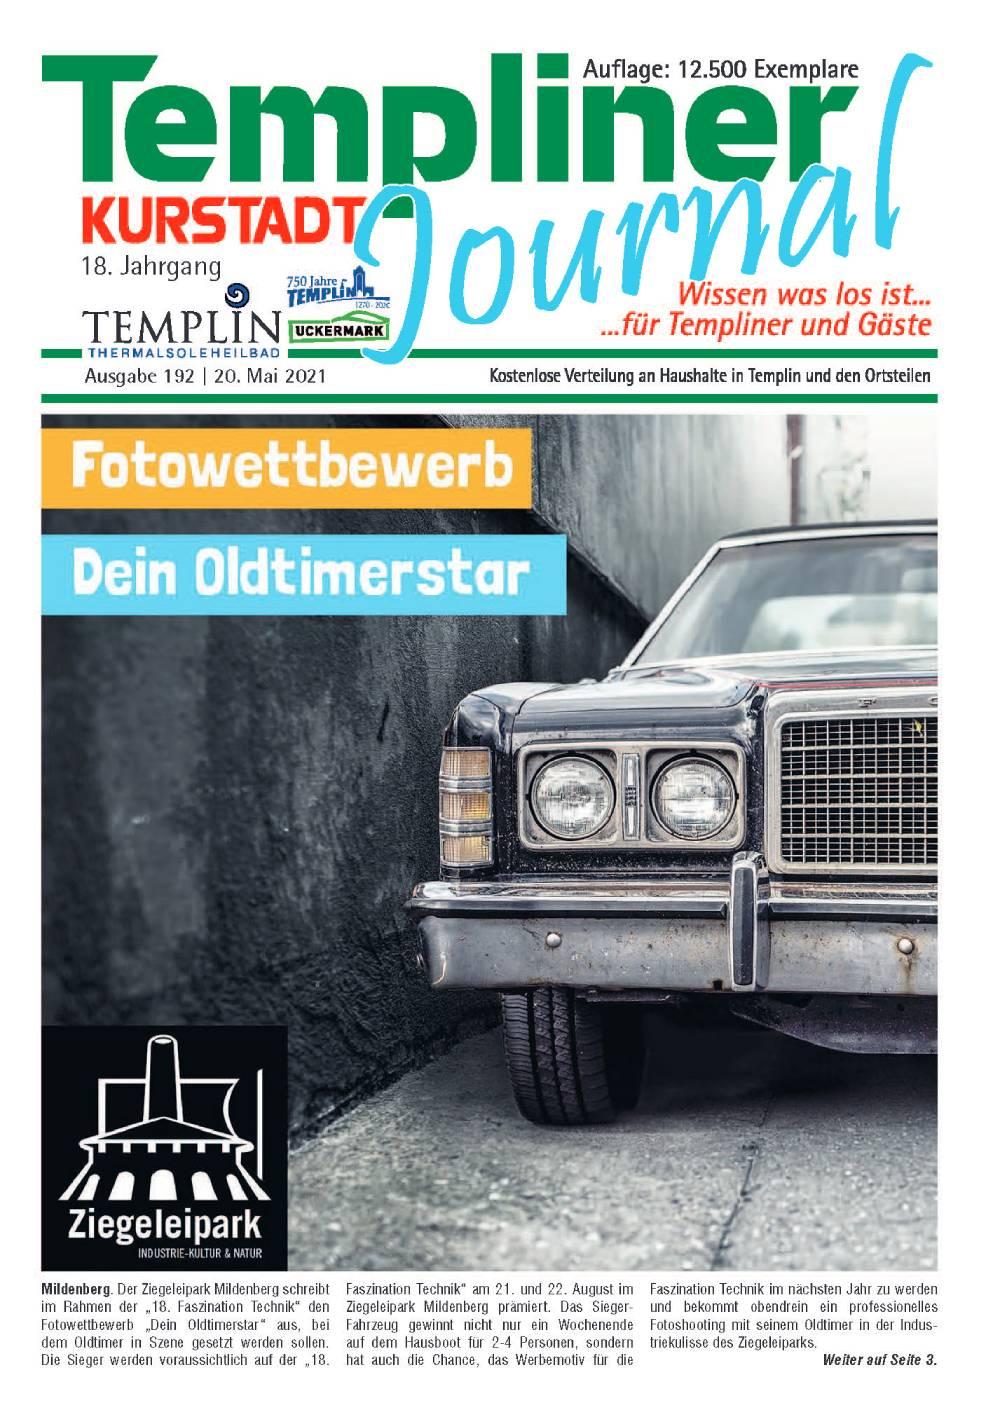 Templiner Kurstadt Journal 192 vom 20.05.2020